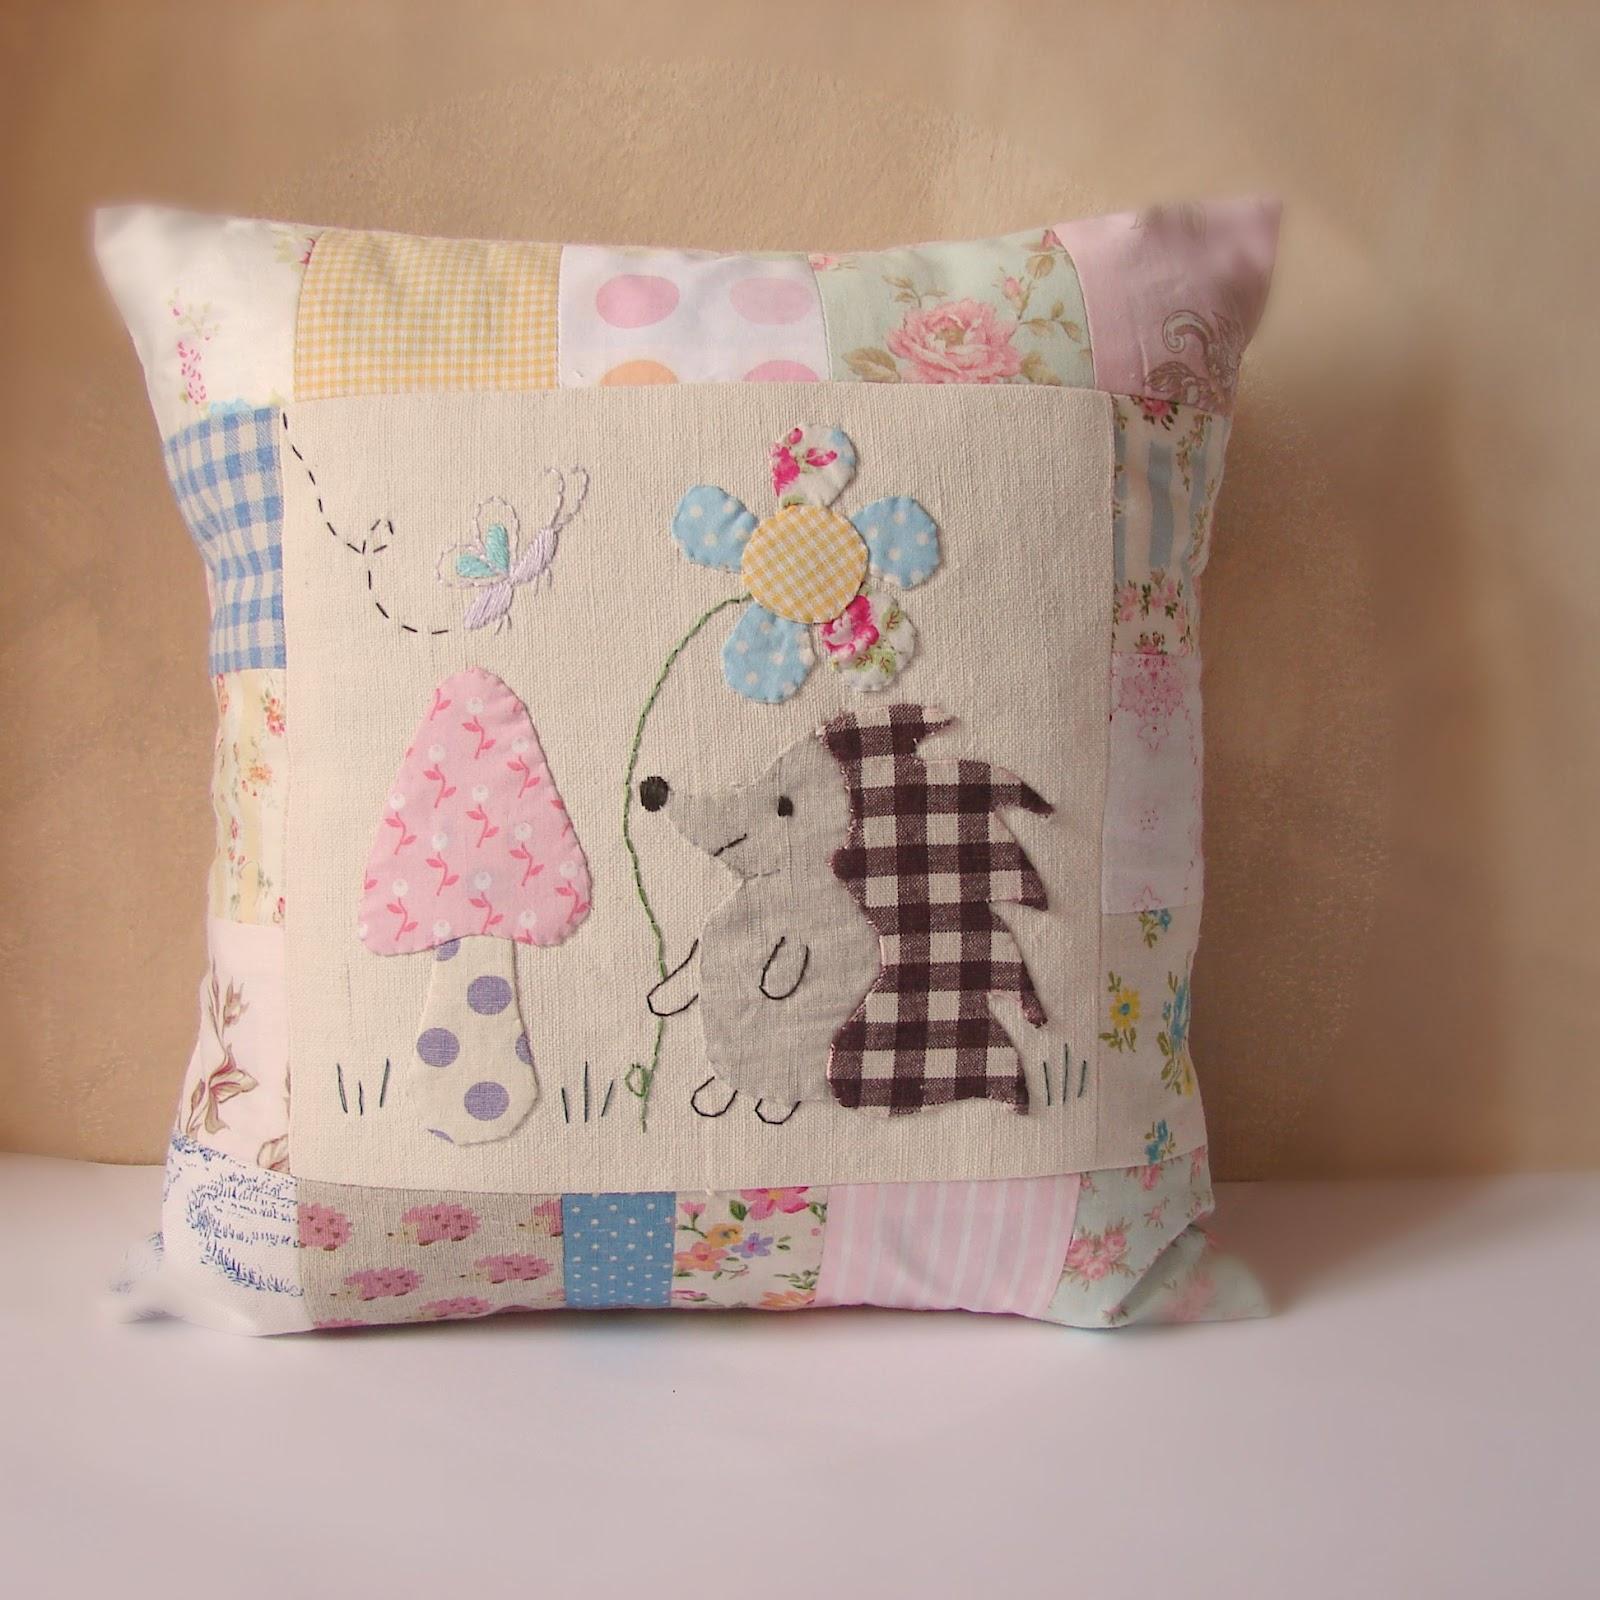 Roxy Creations Hedgehog Applique Cushions